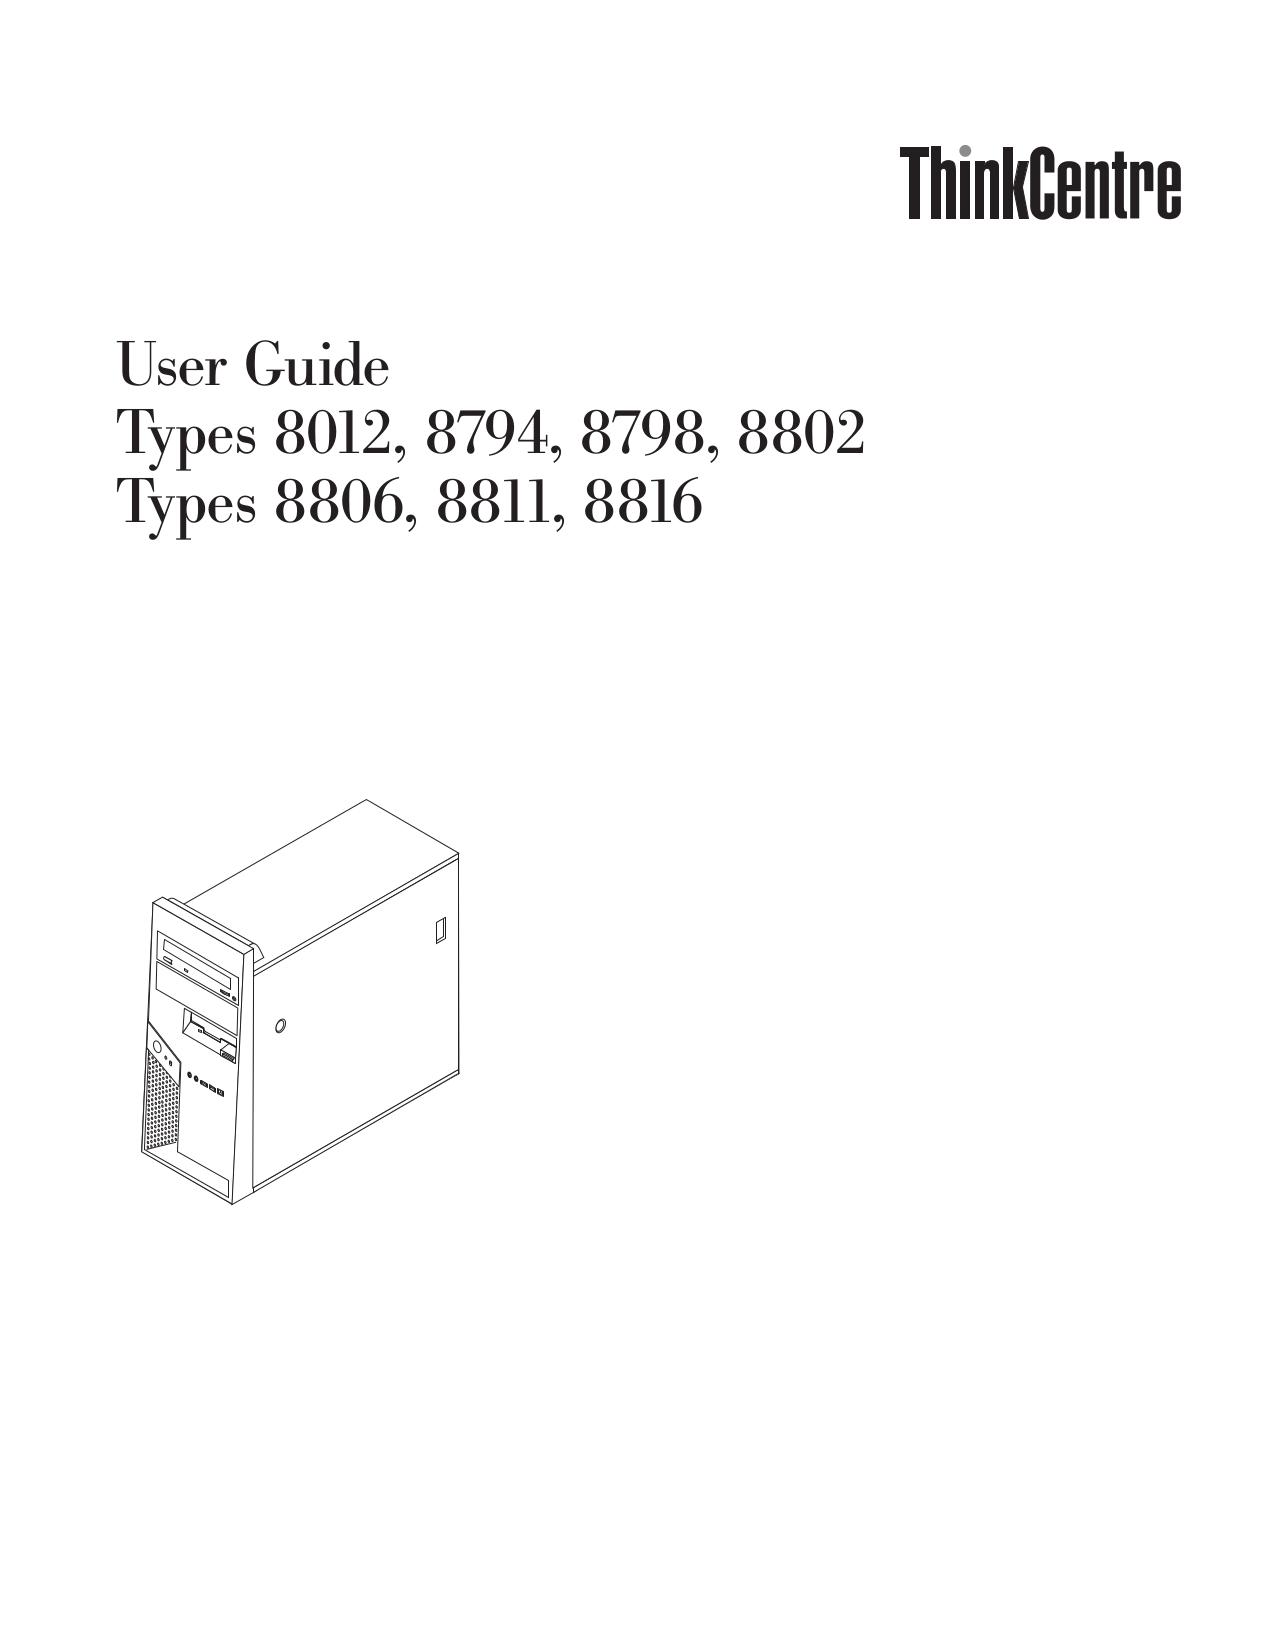 pdf for Lenovo Desktop ThinkCentre M55p 8798 manual